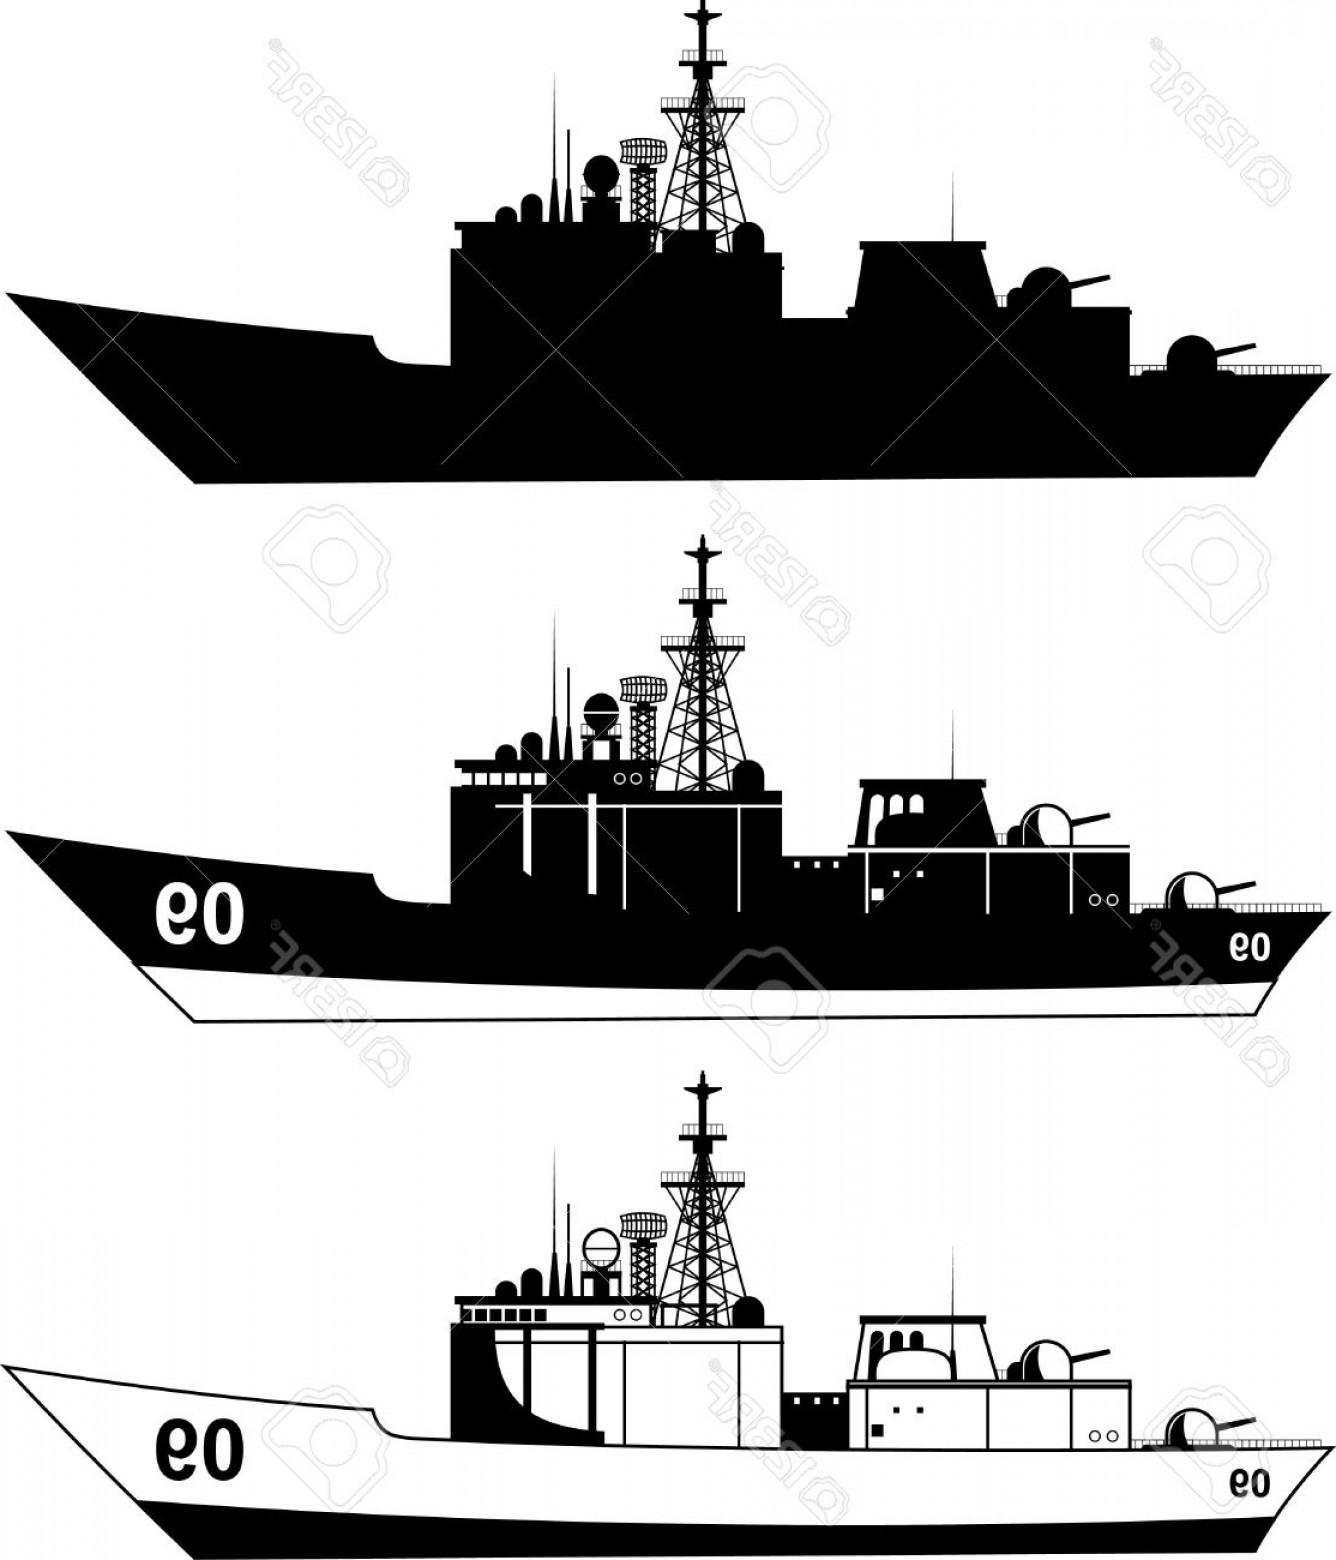 1336x1560 Photostock Vector War Military Ship Vector Illustration Arenawp